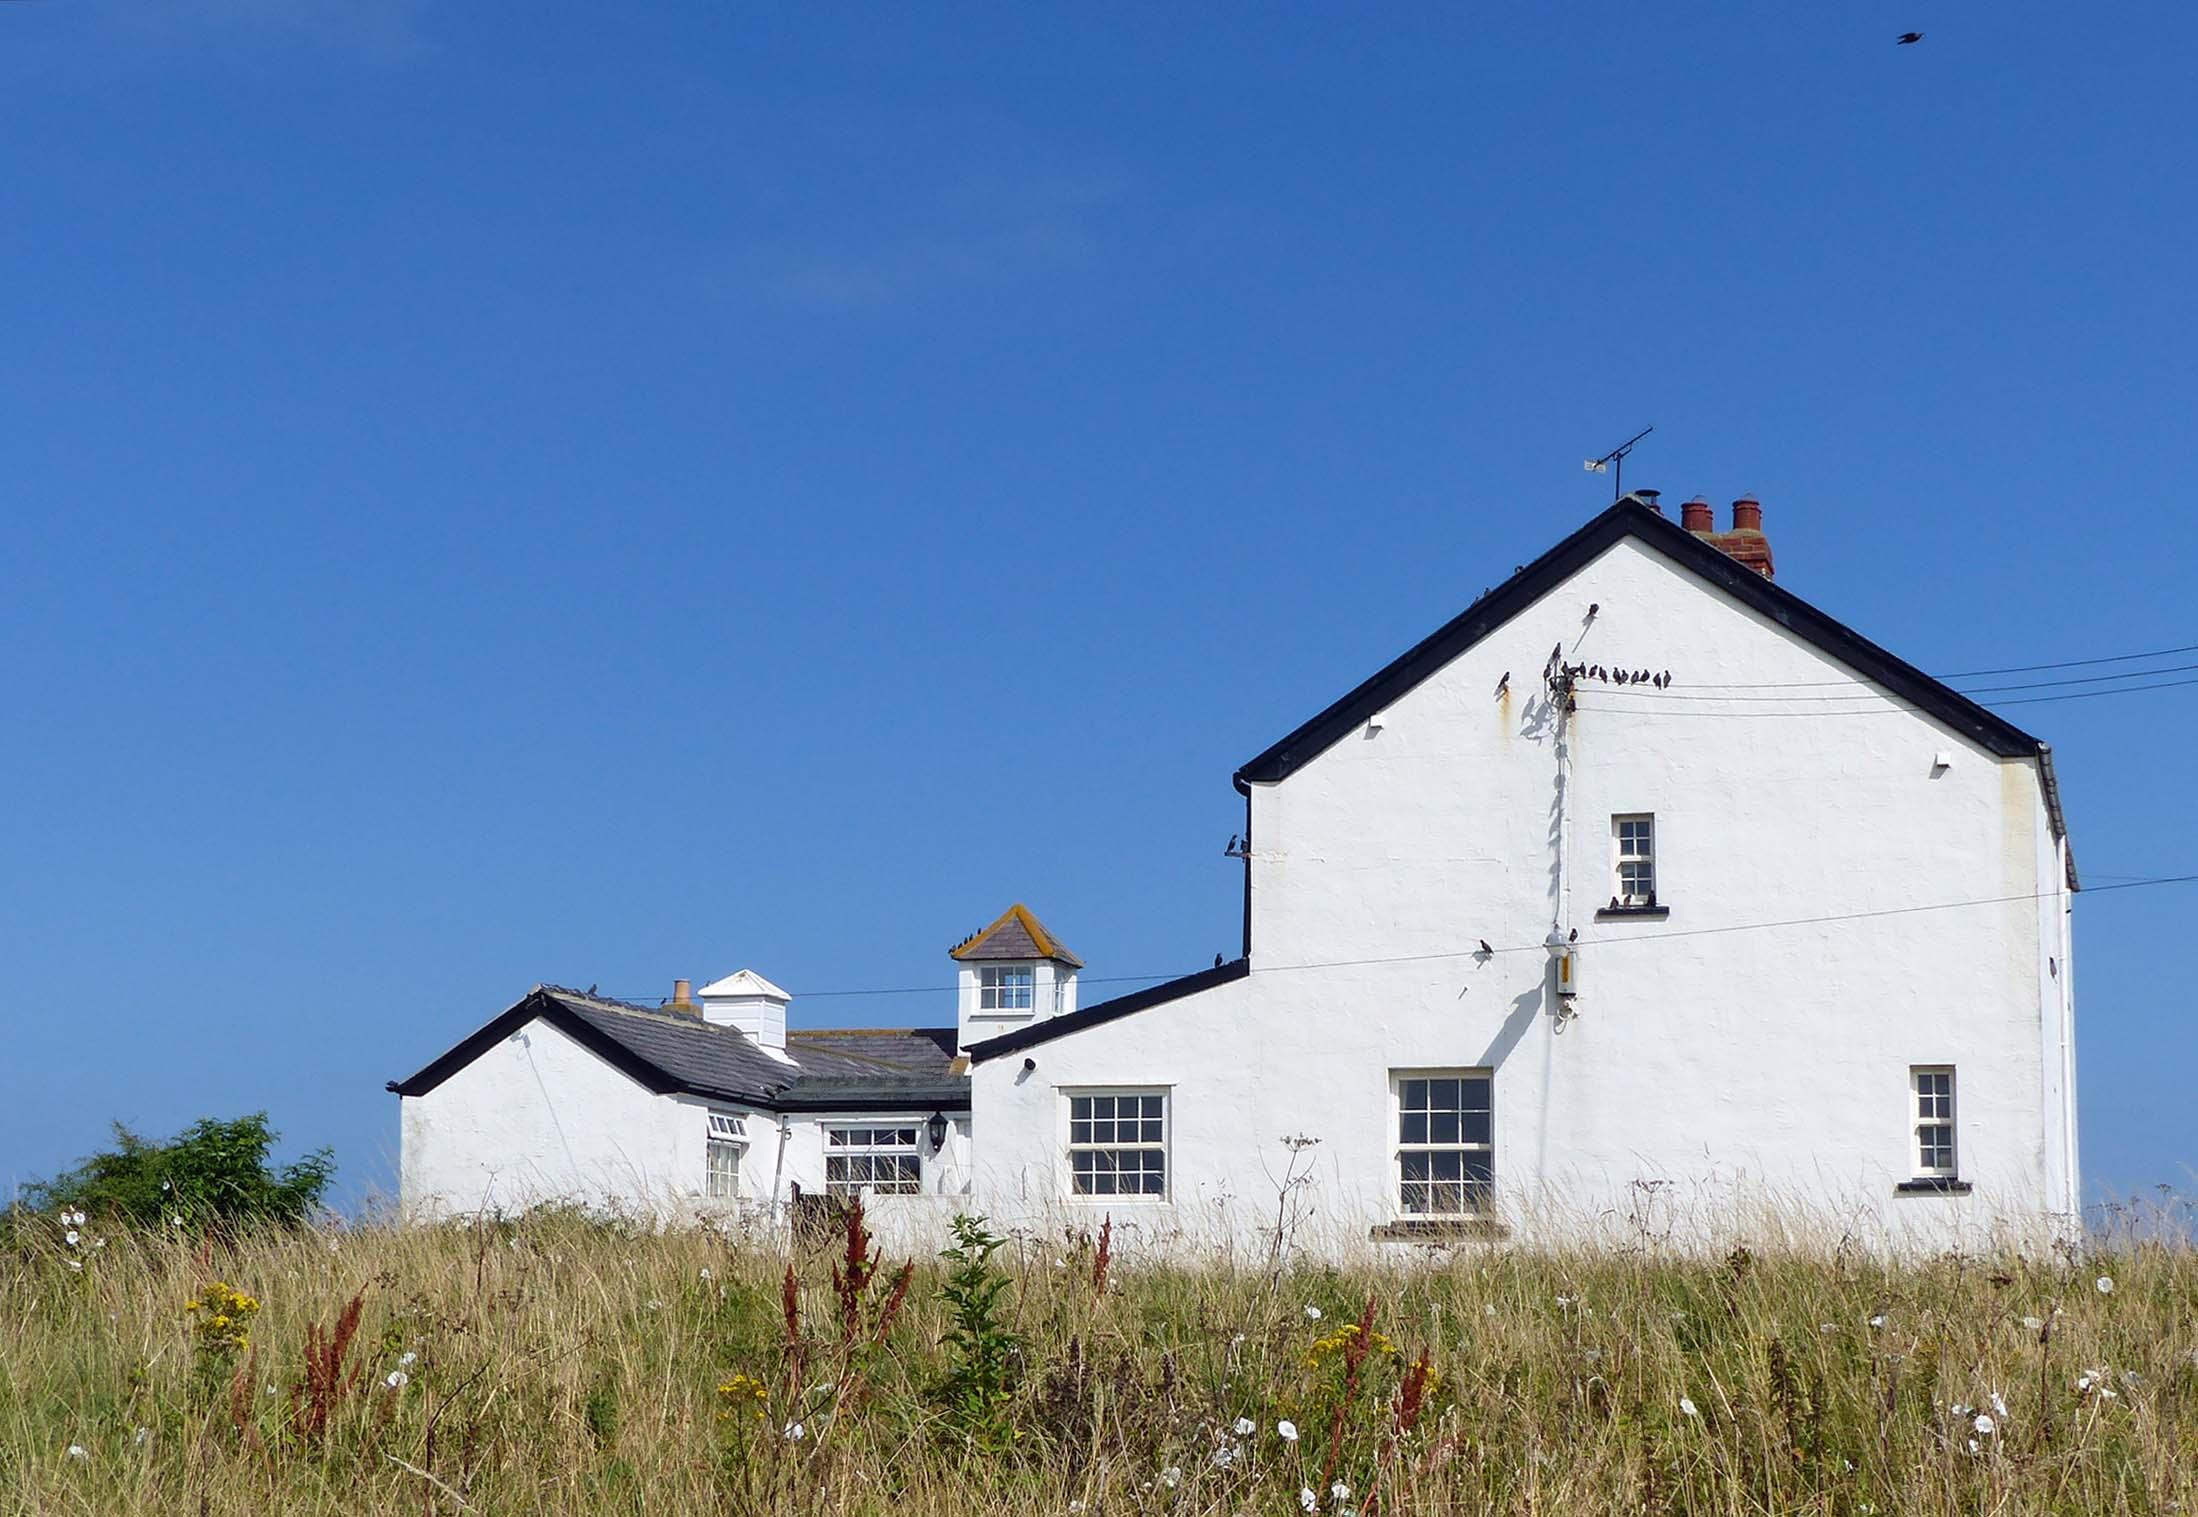 White buildings in overgrown field